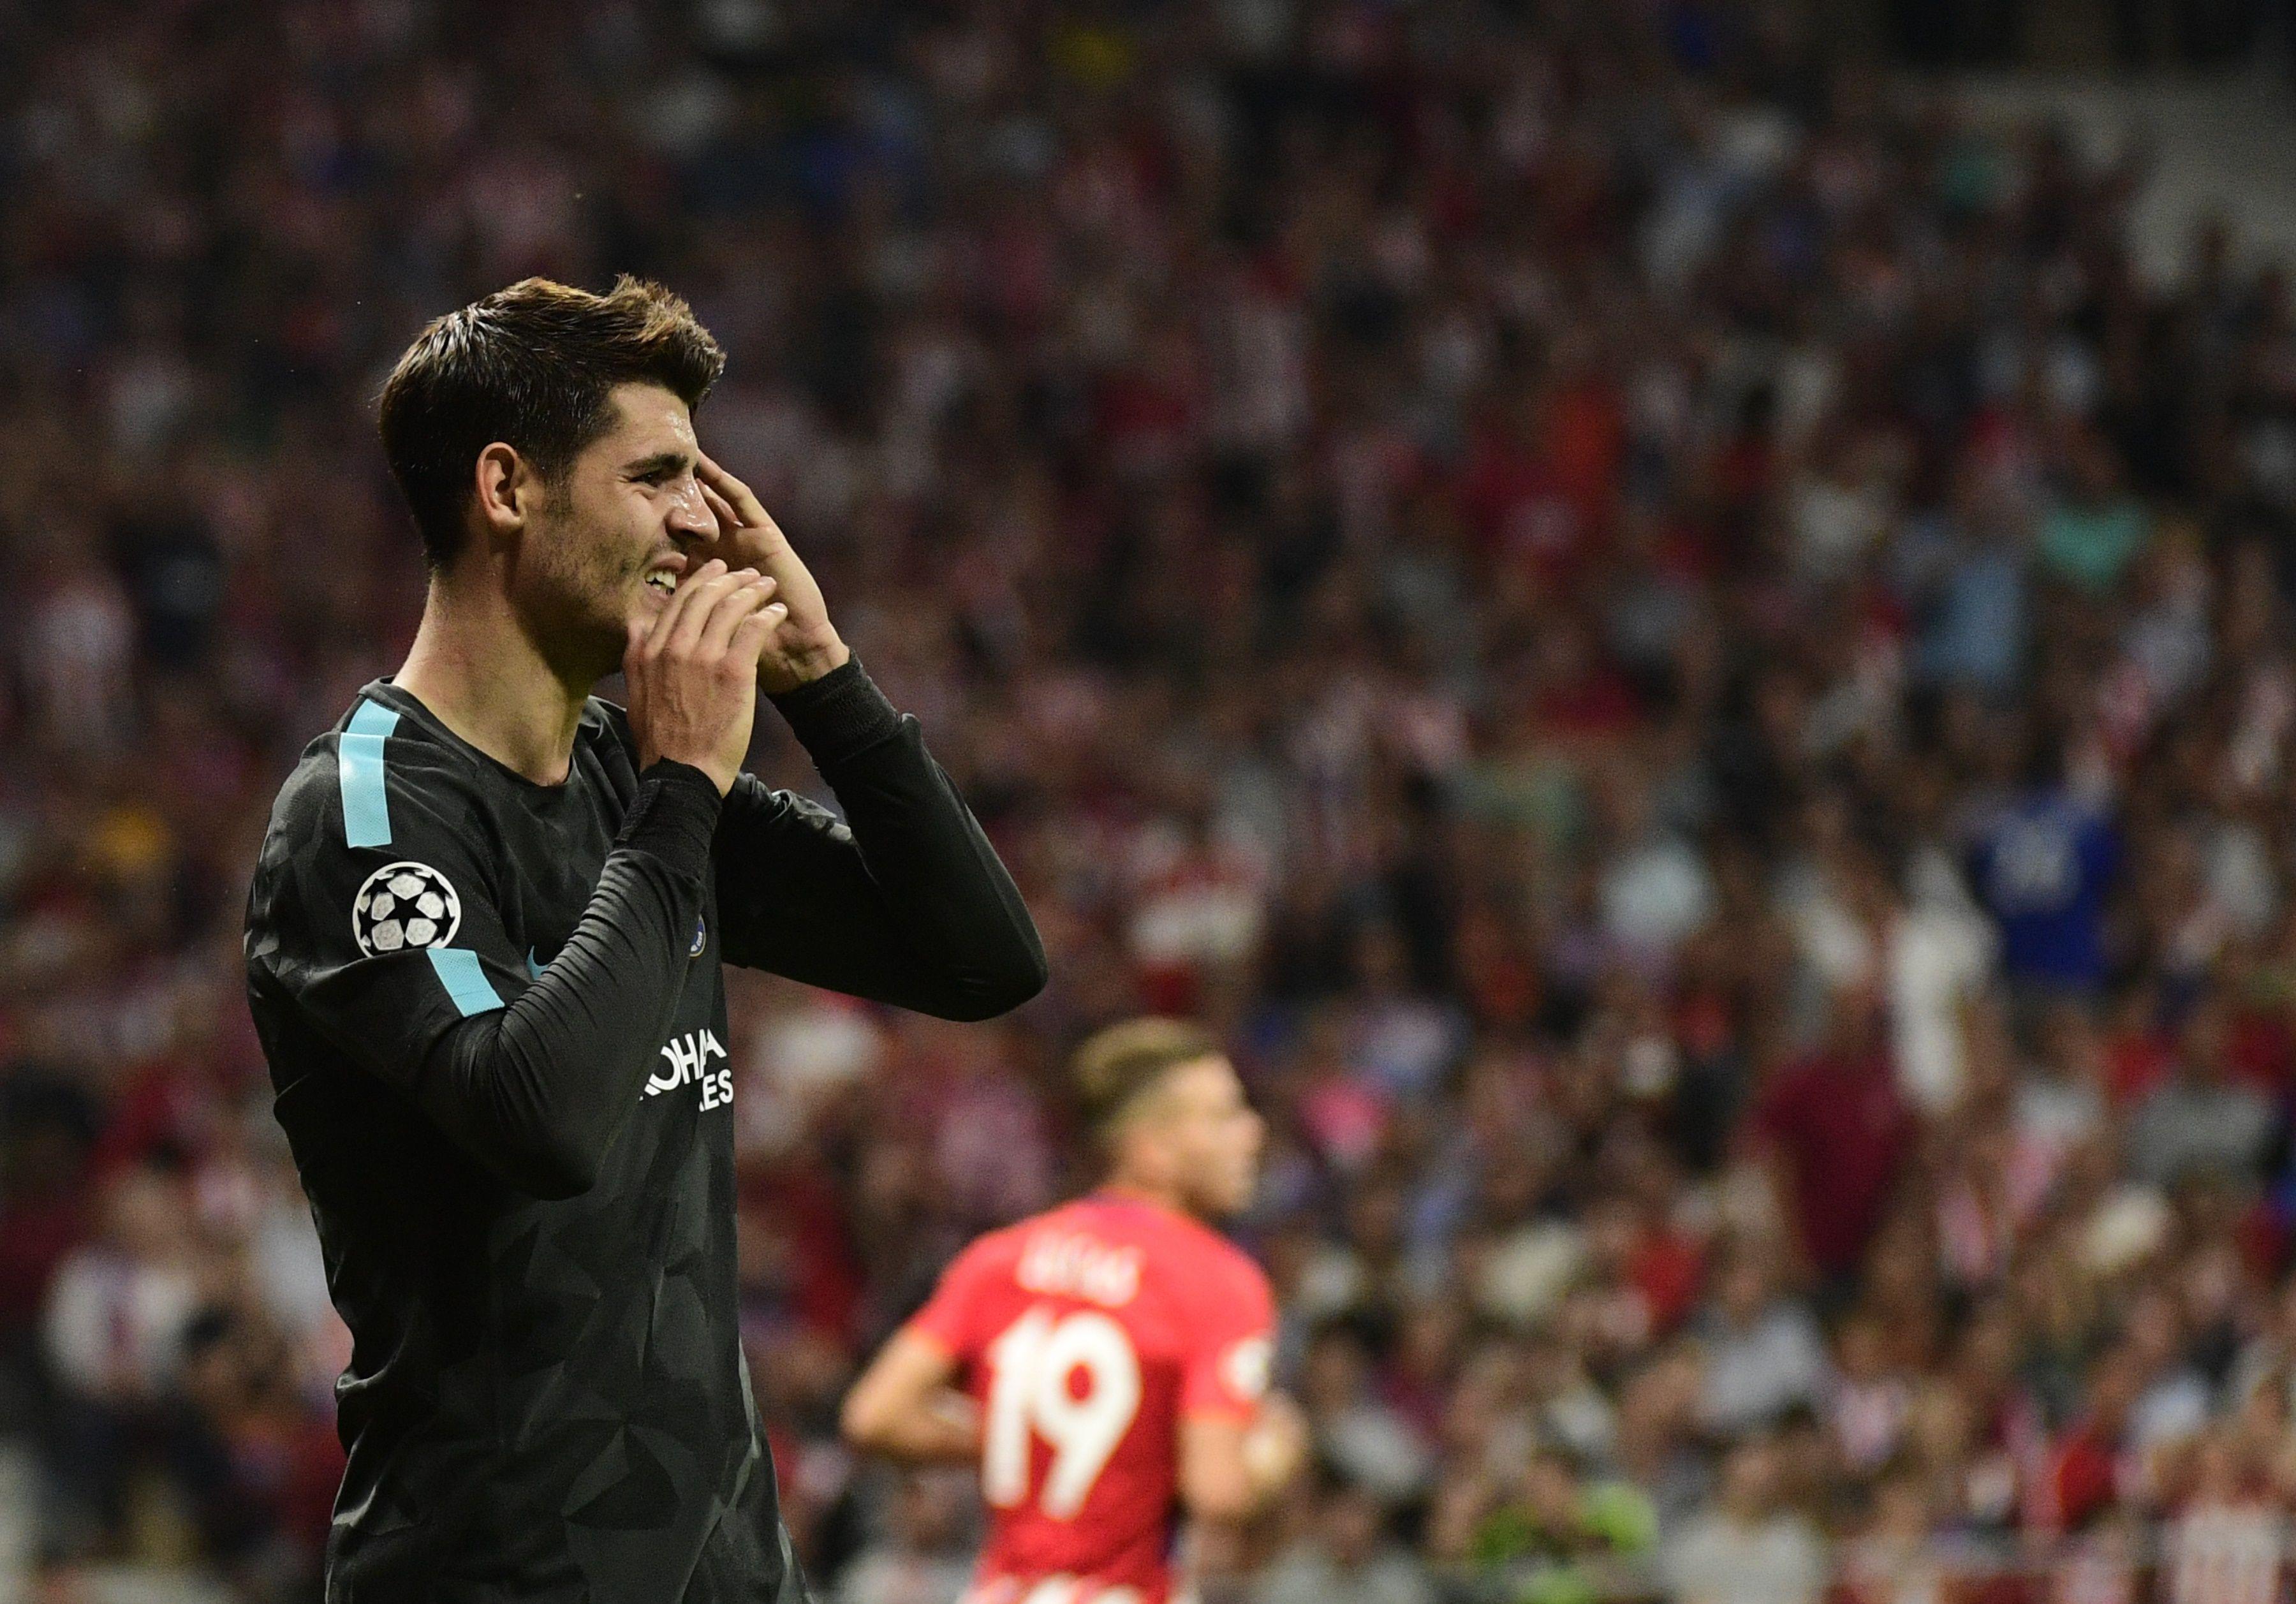 Chelsea star Alvaro Morata is facing six weeks on the sidelines